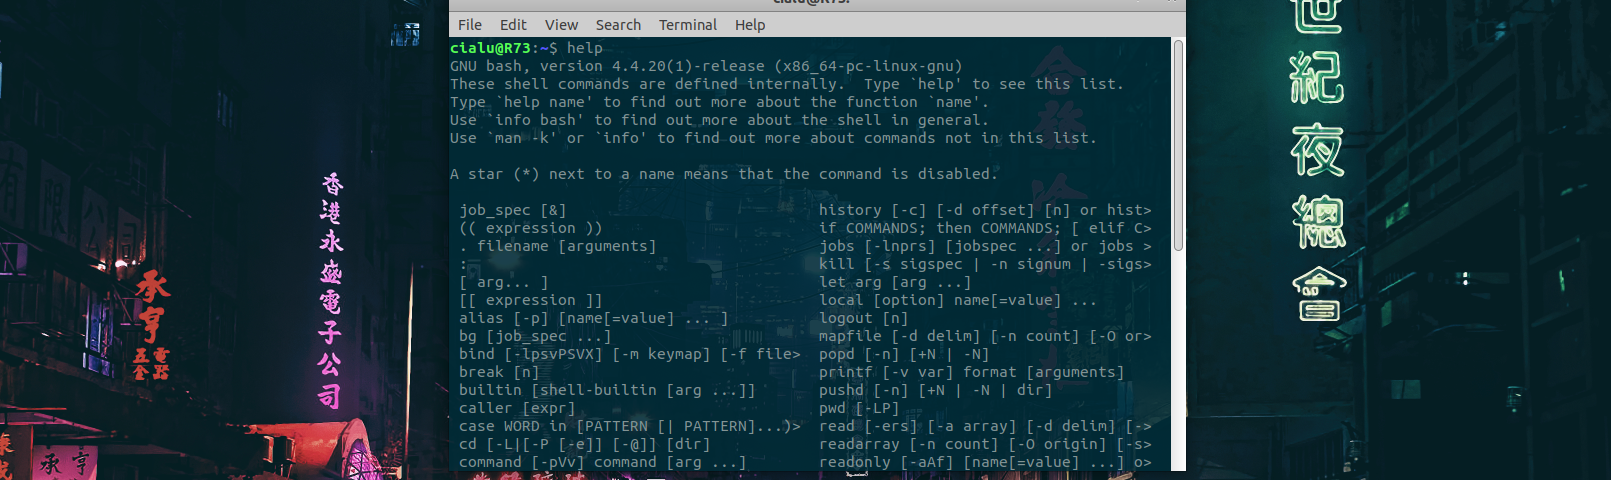 Bash scripting - Help in terminal window